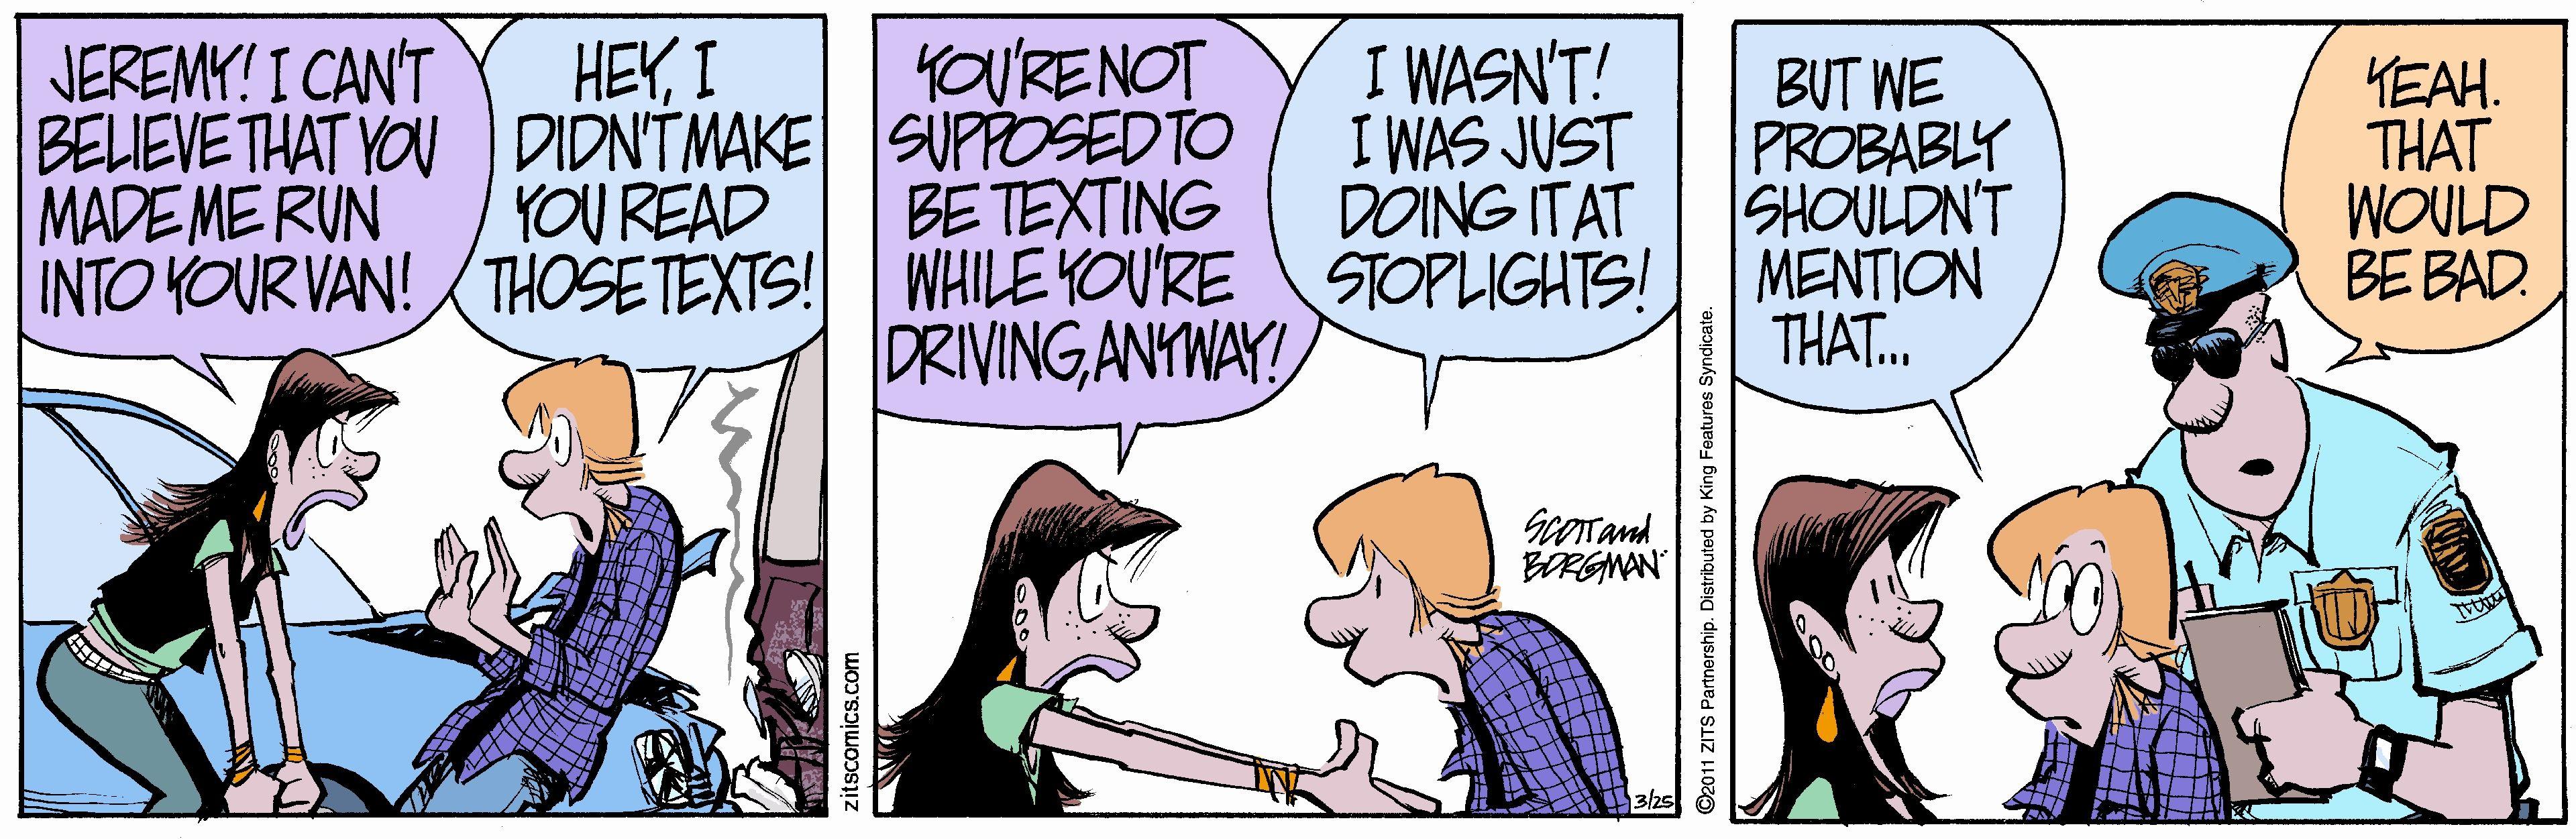 Comic strip driving a manual